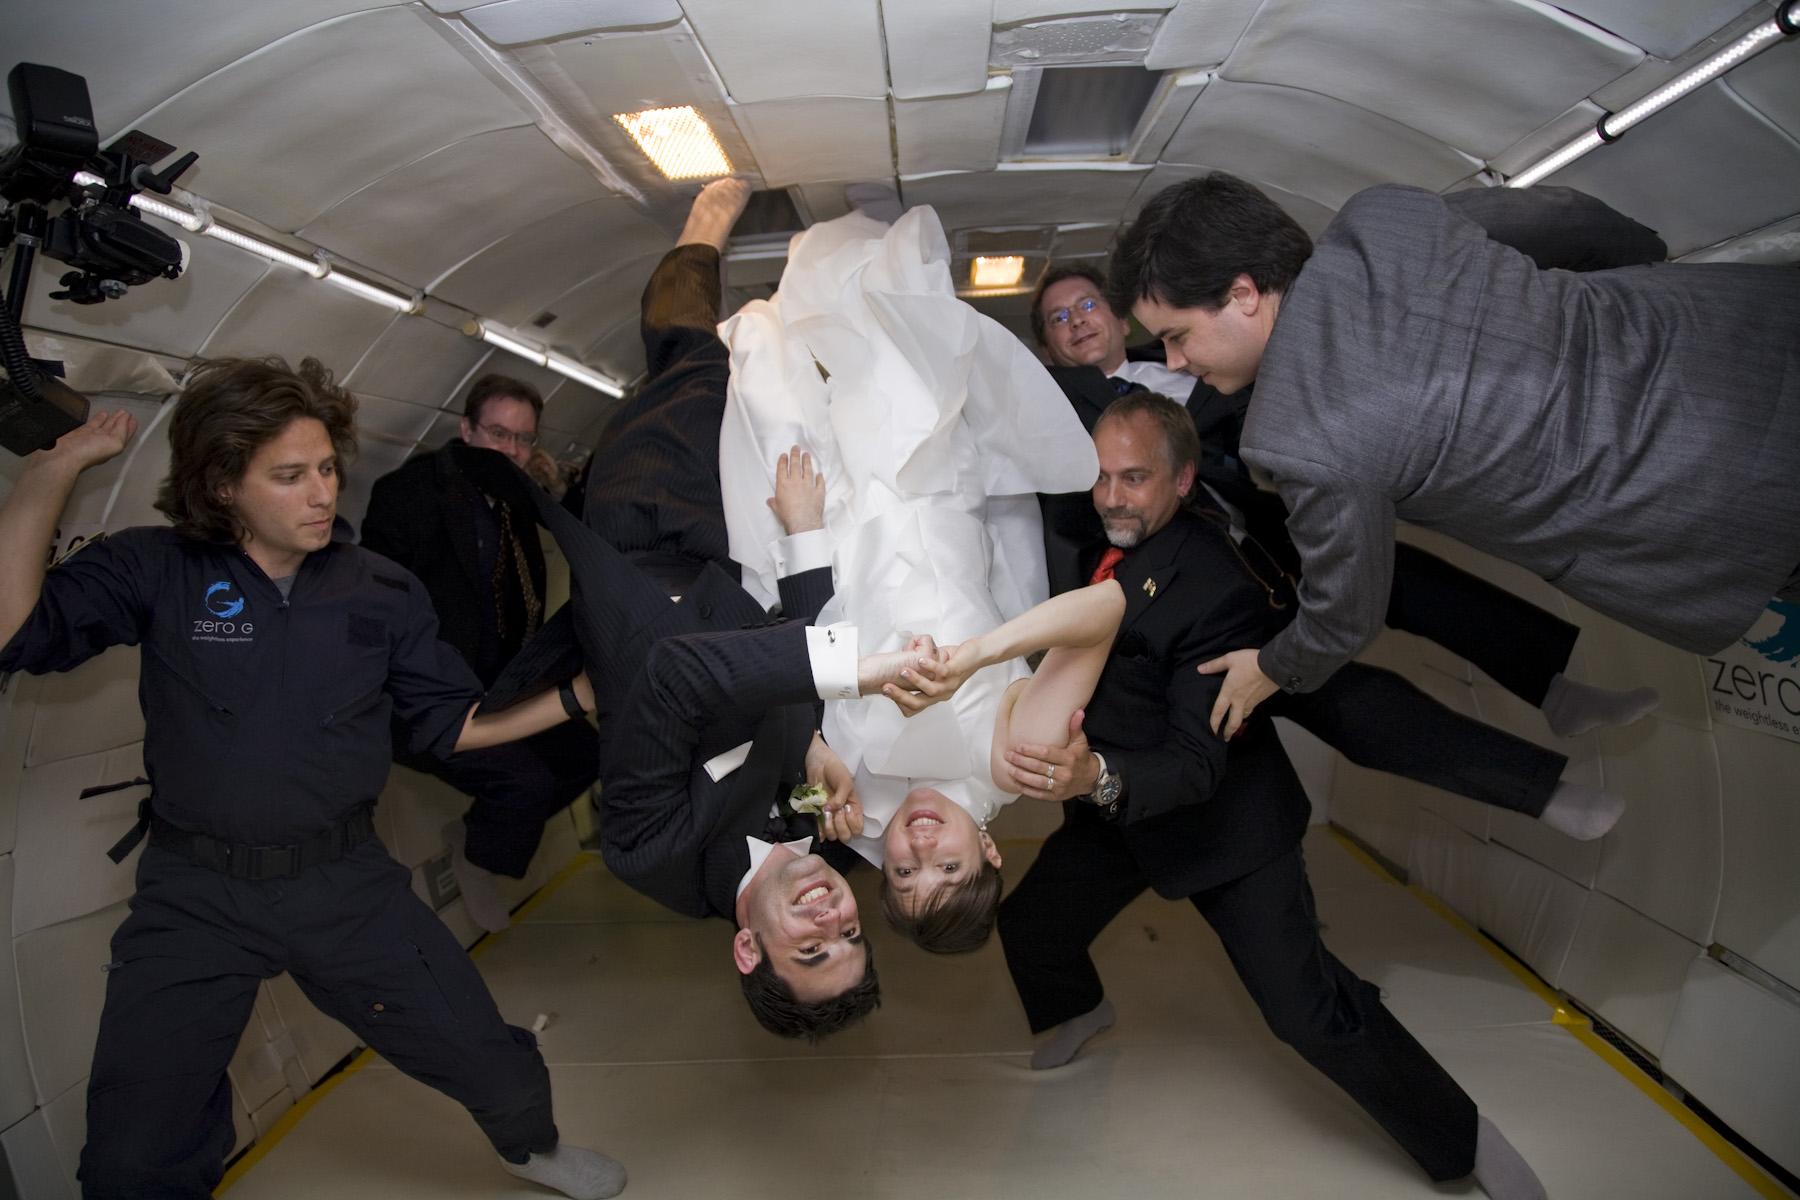 weightless wedding experience zero-g zero gravity weddings